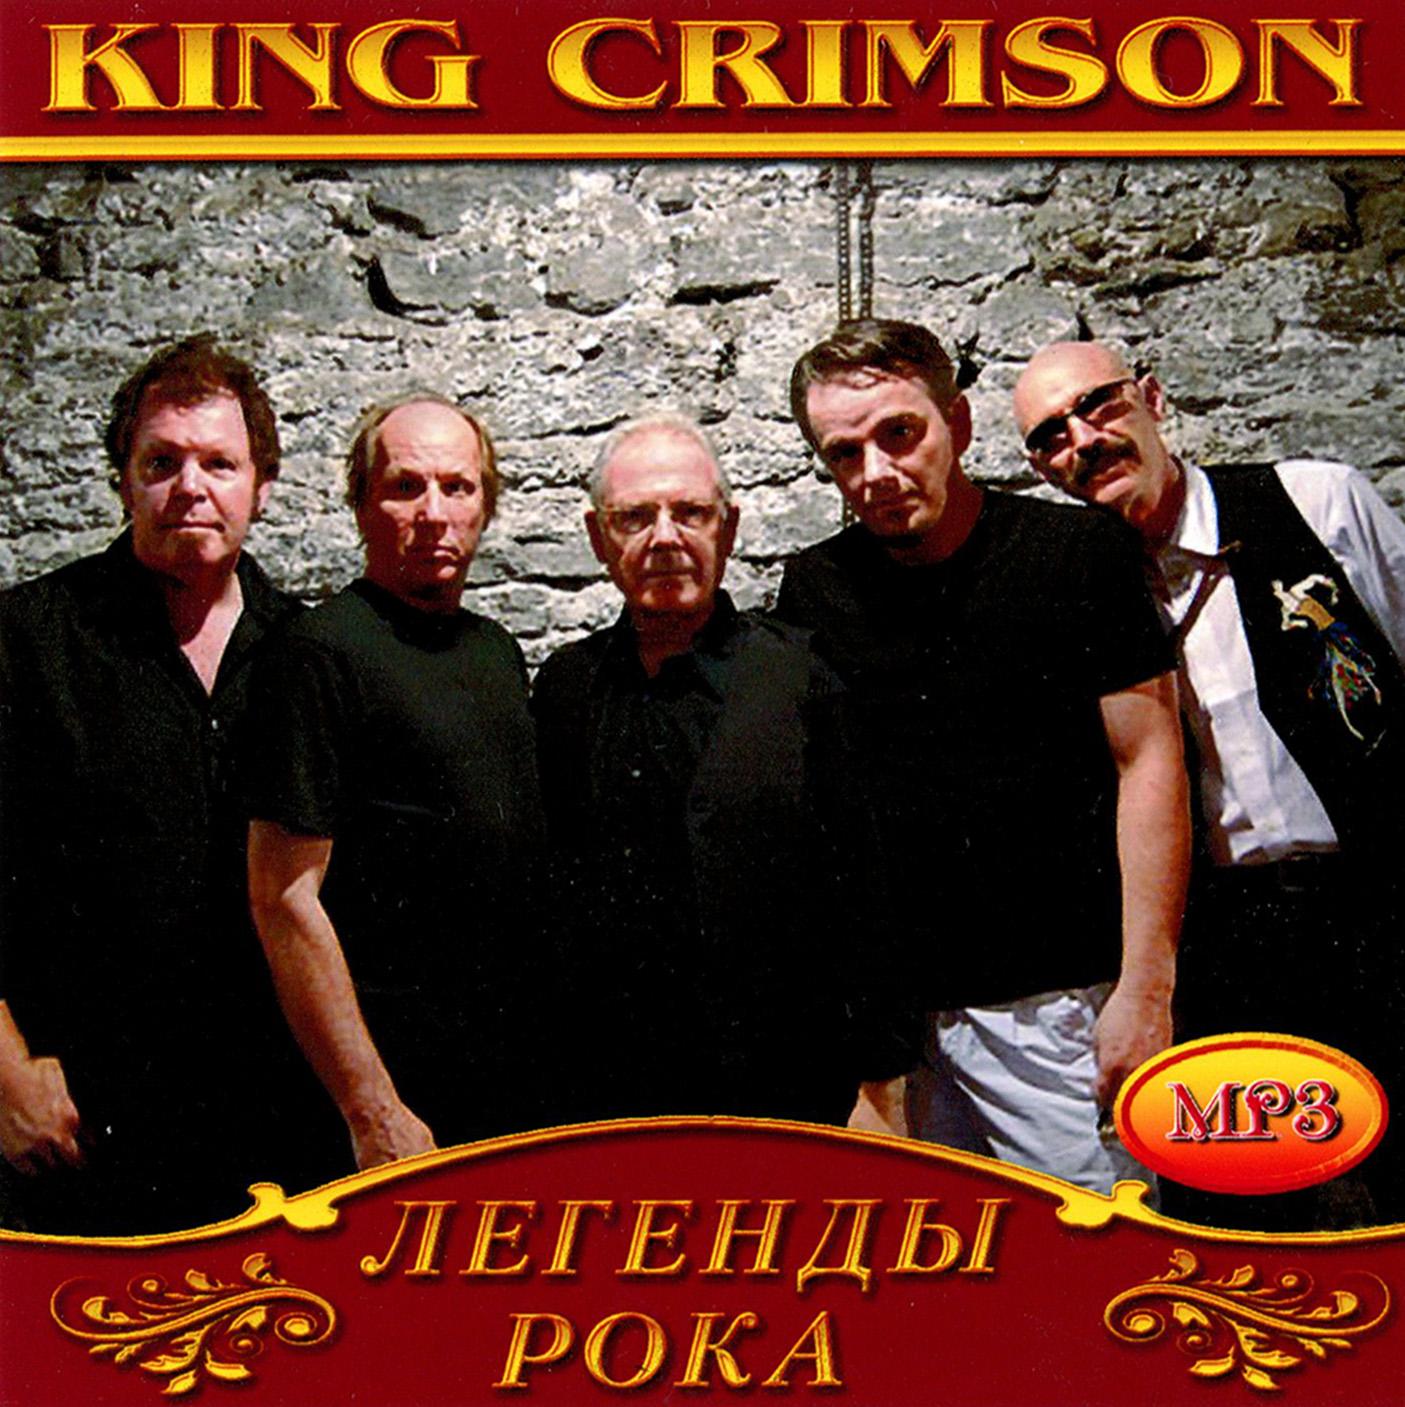 King Crimson [mp3]